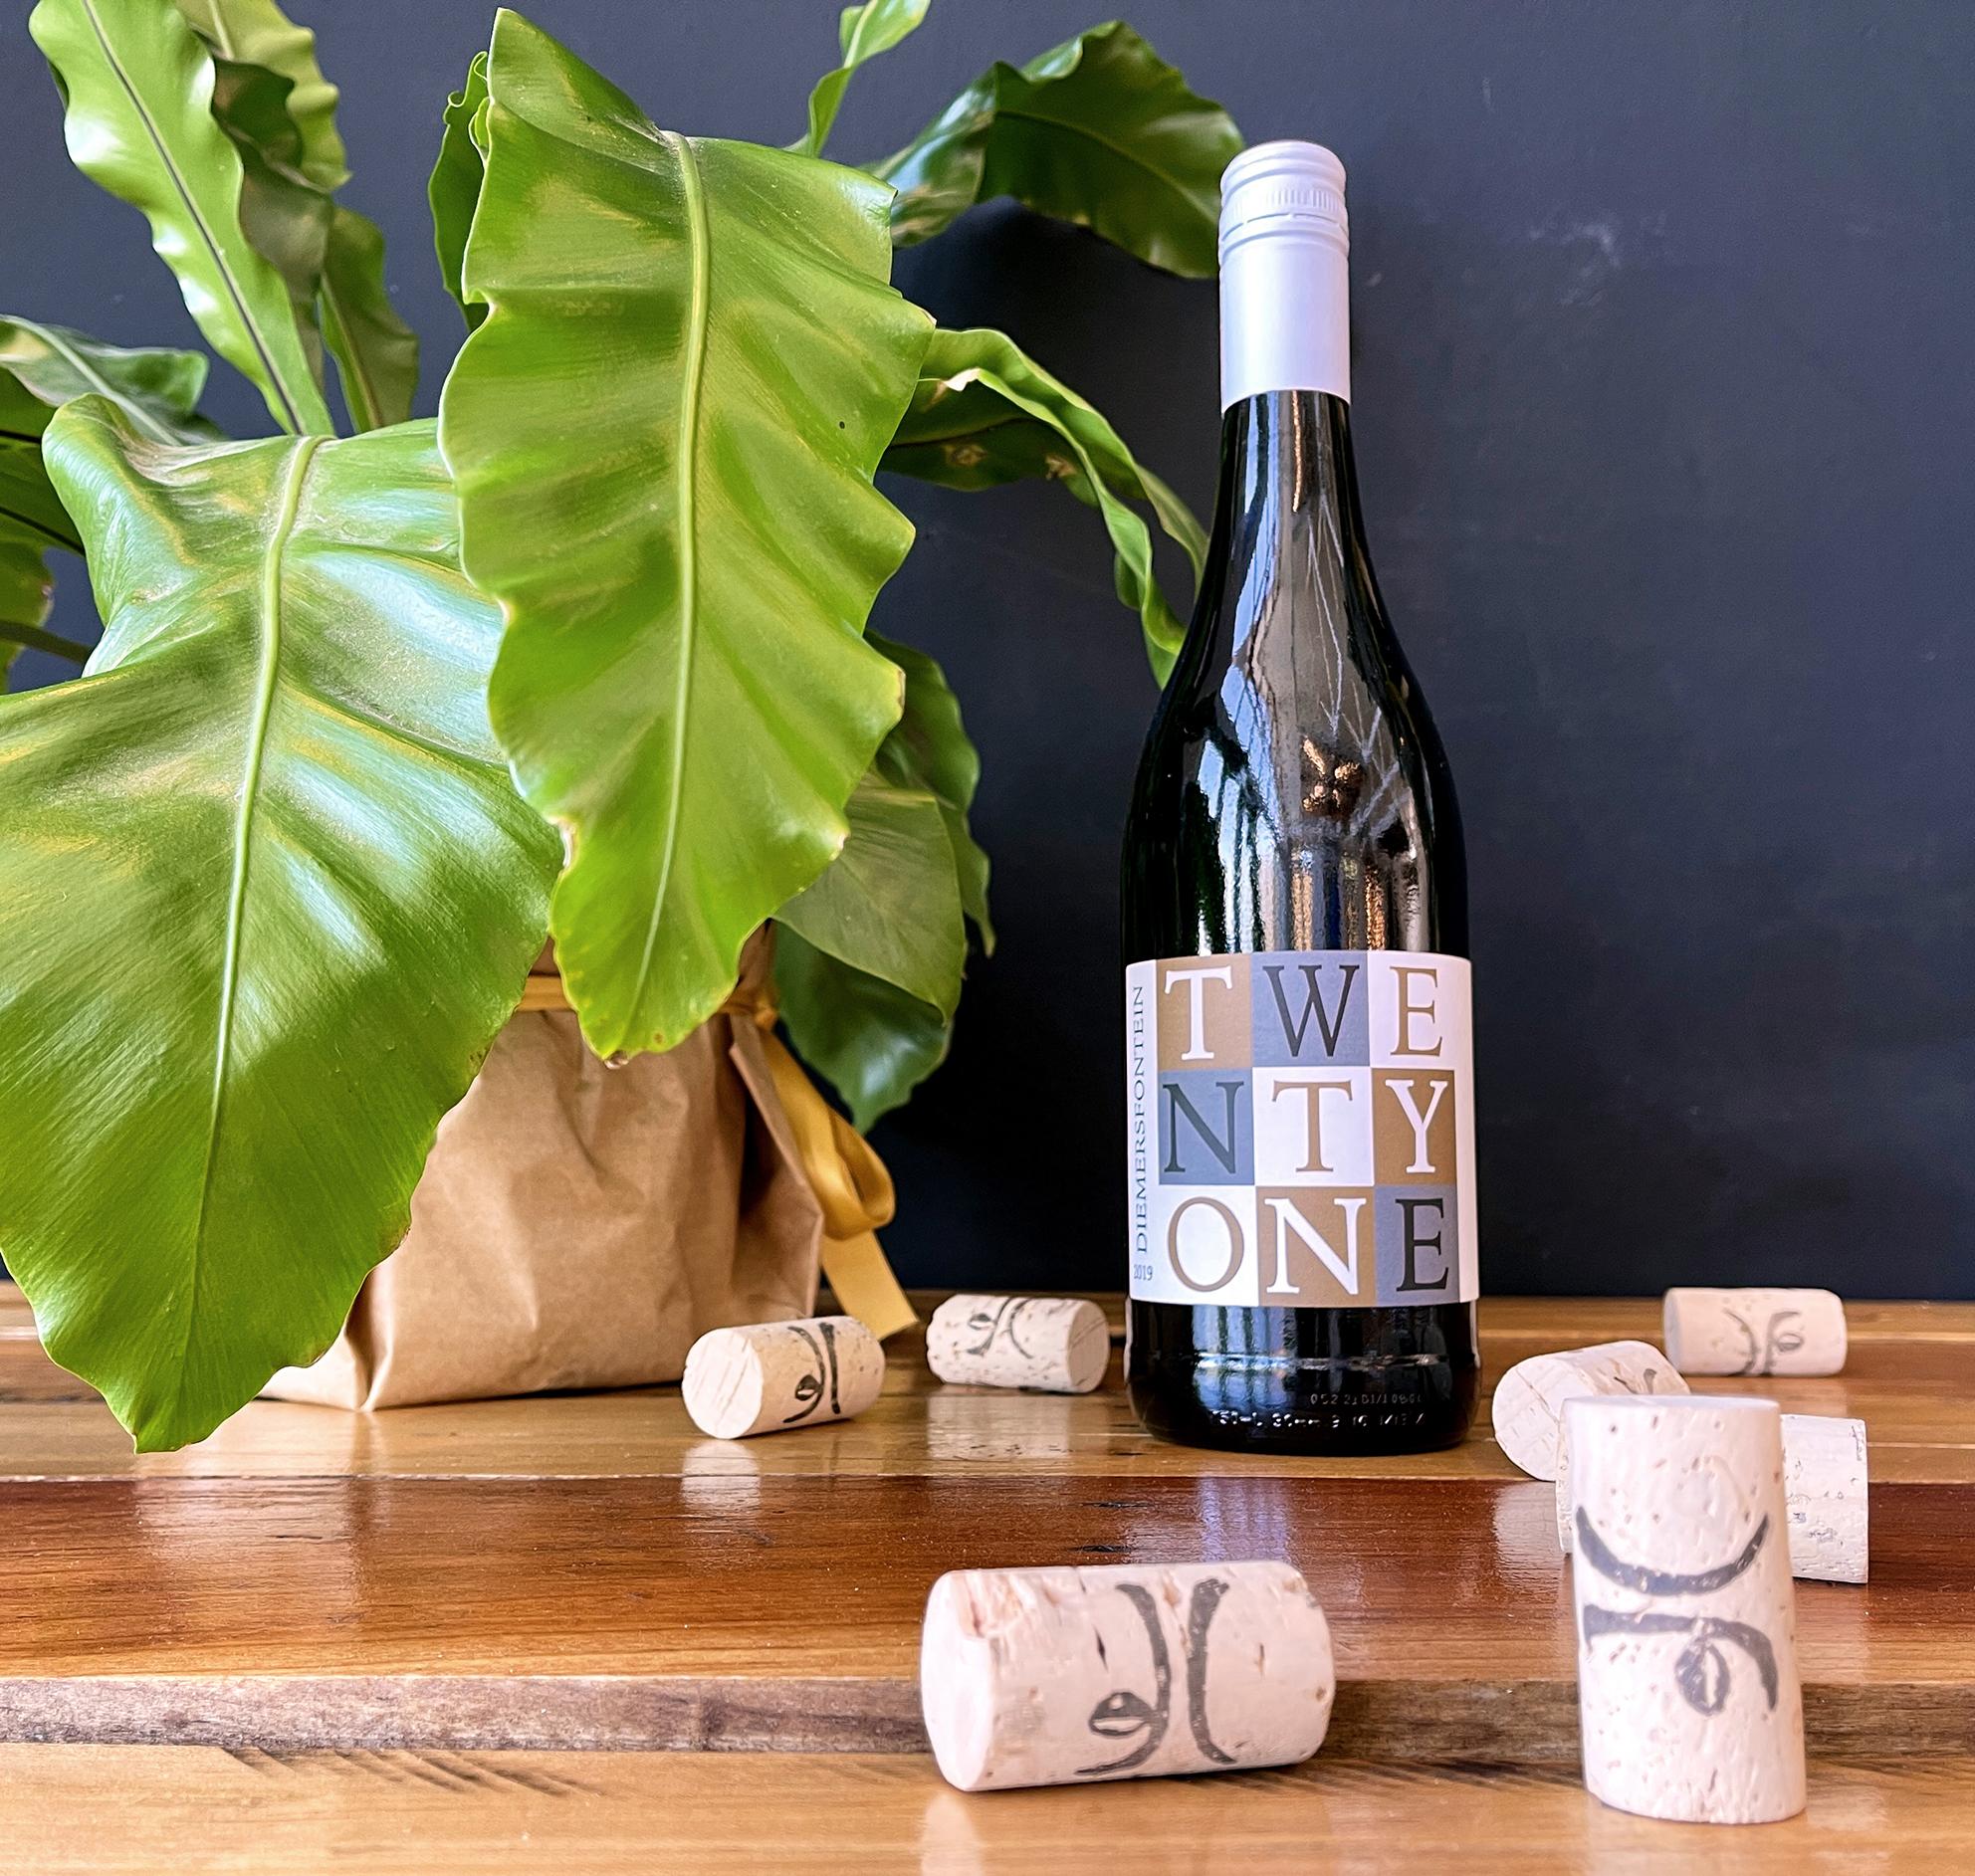 Diemersfontein Celebrates 21st Vintage With New Limited-edition Wine photo